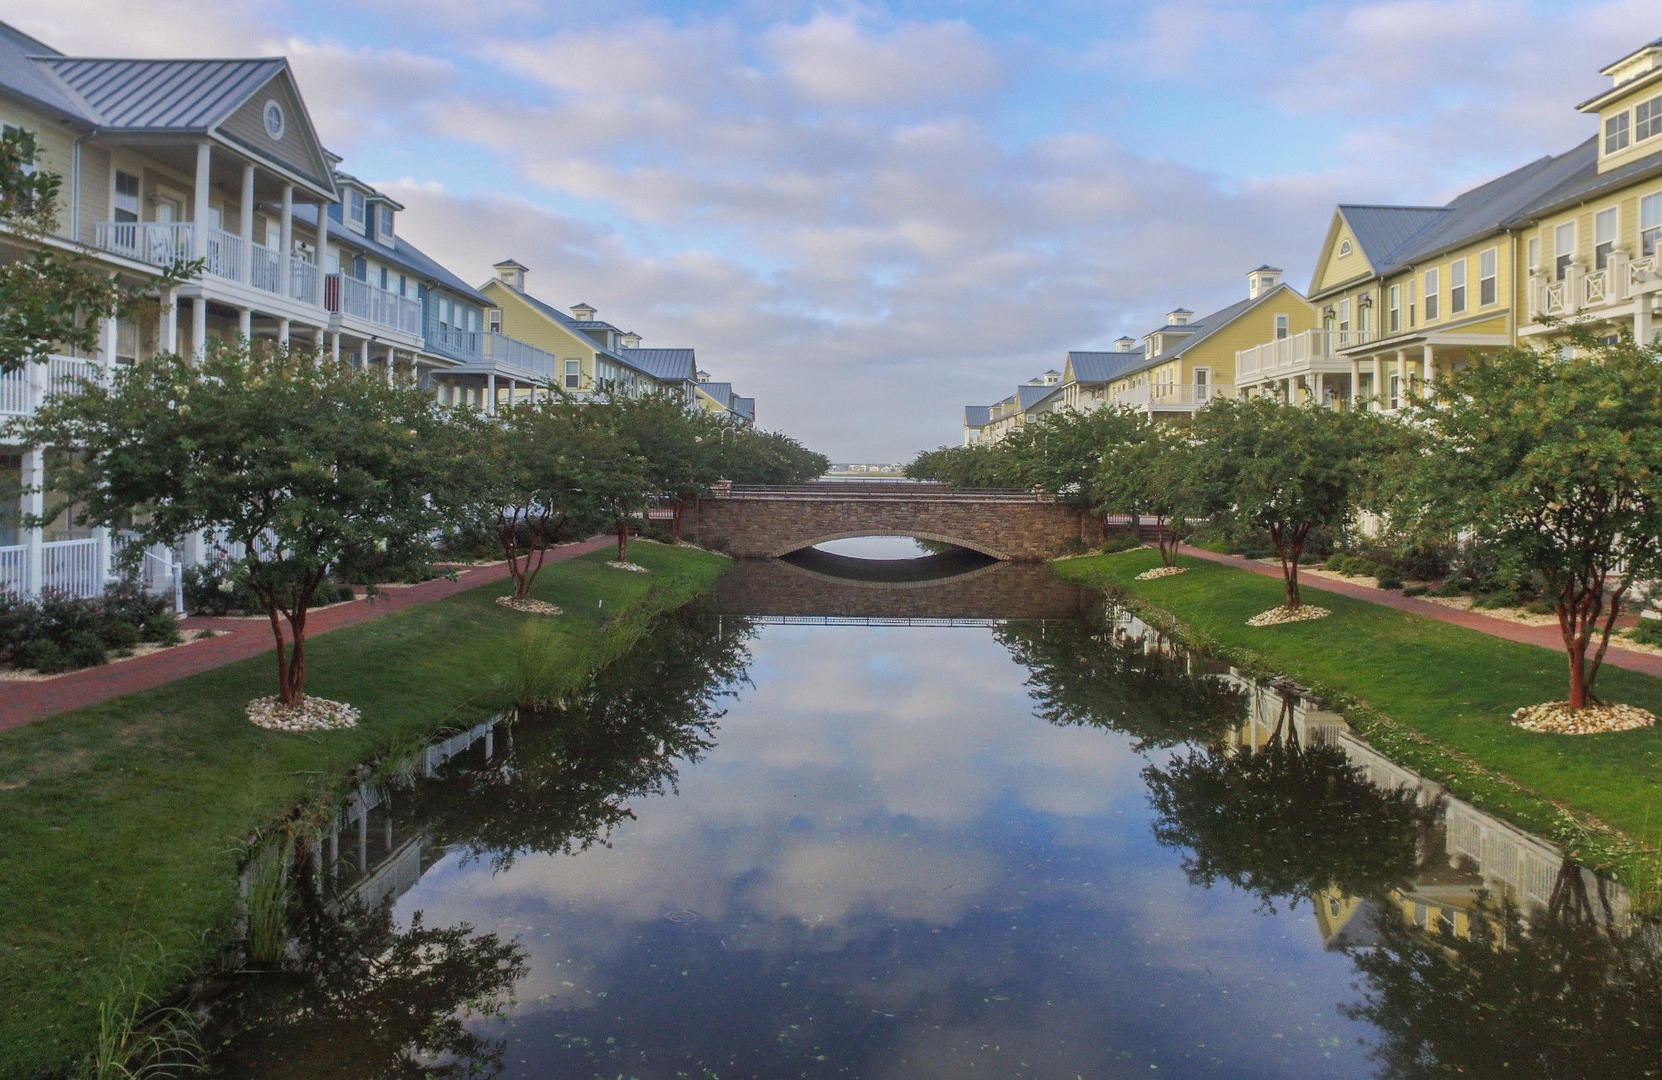 Sunset Island Canal and Bridges